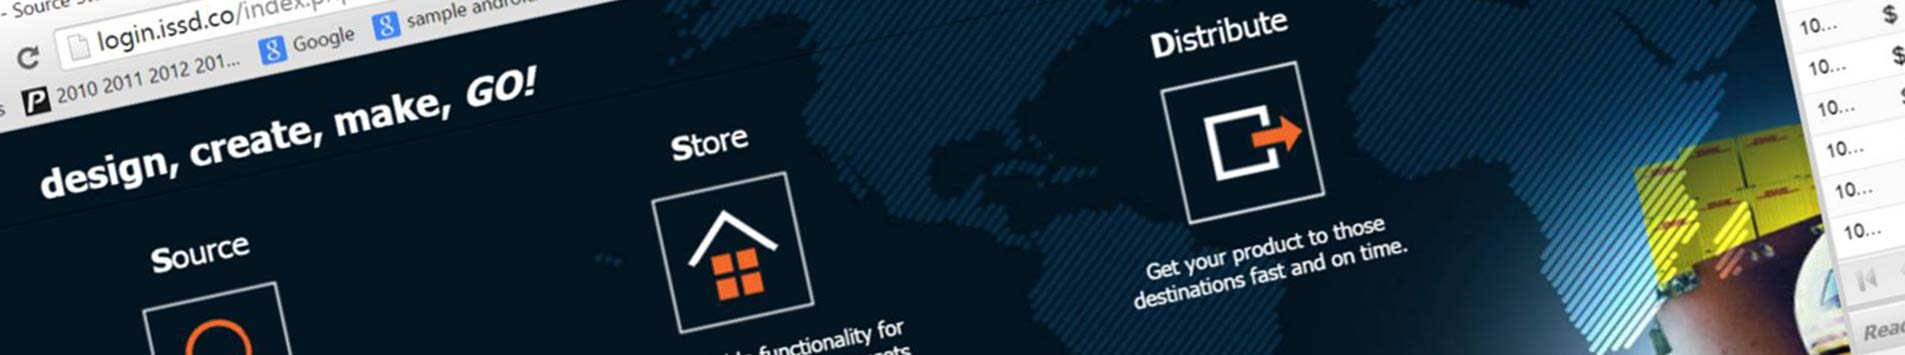 pma-global-issd-procurement